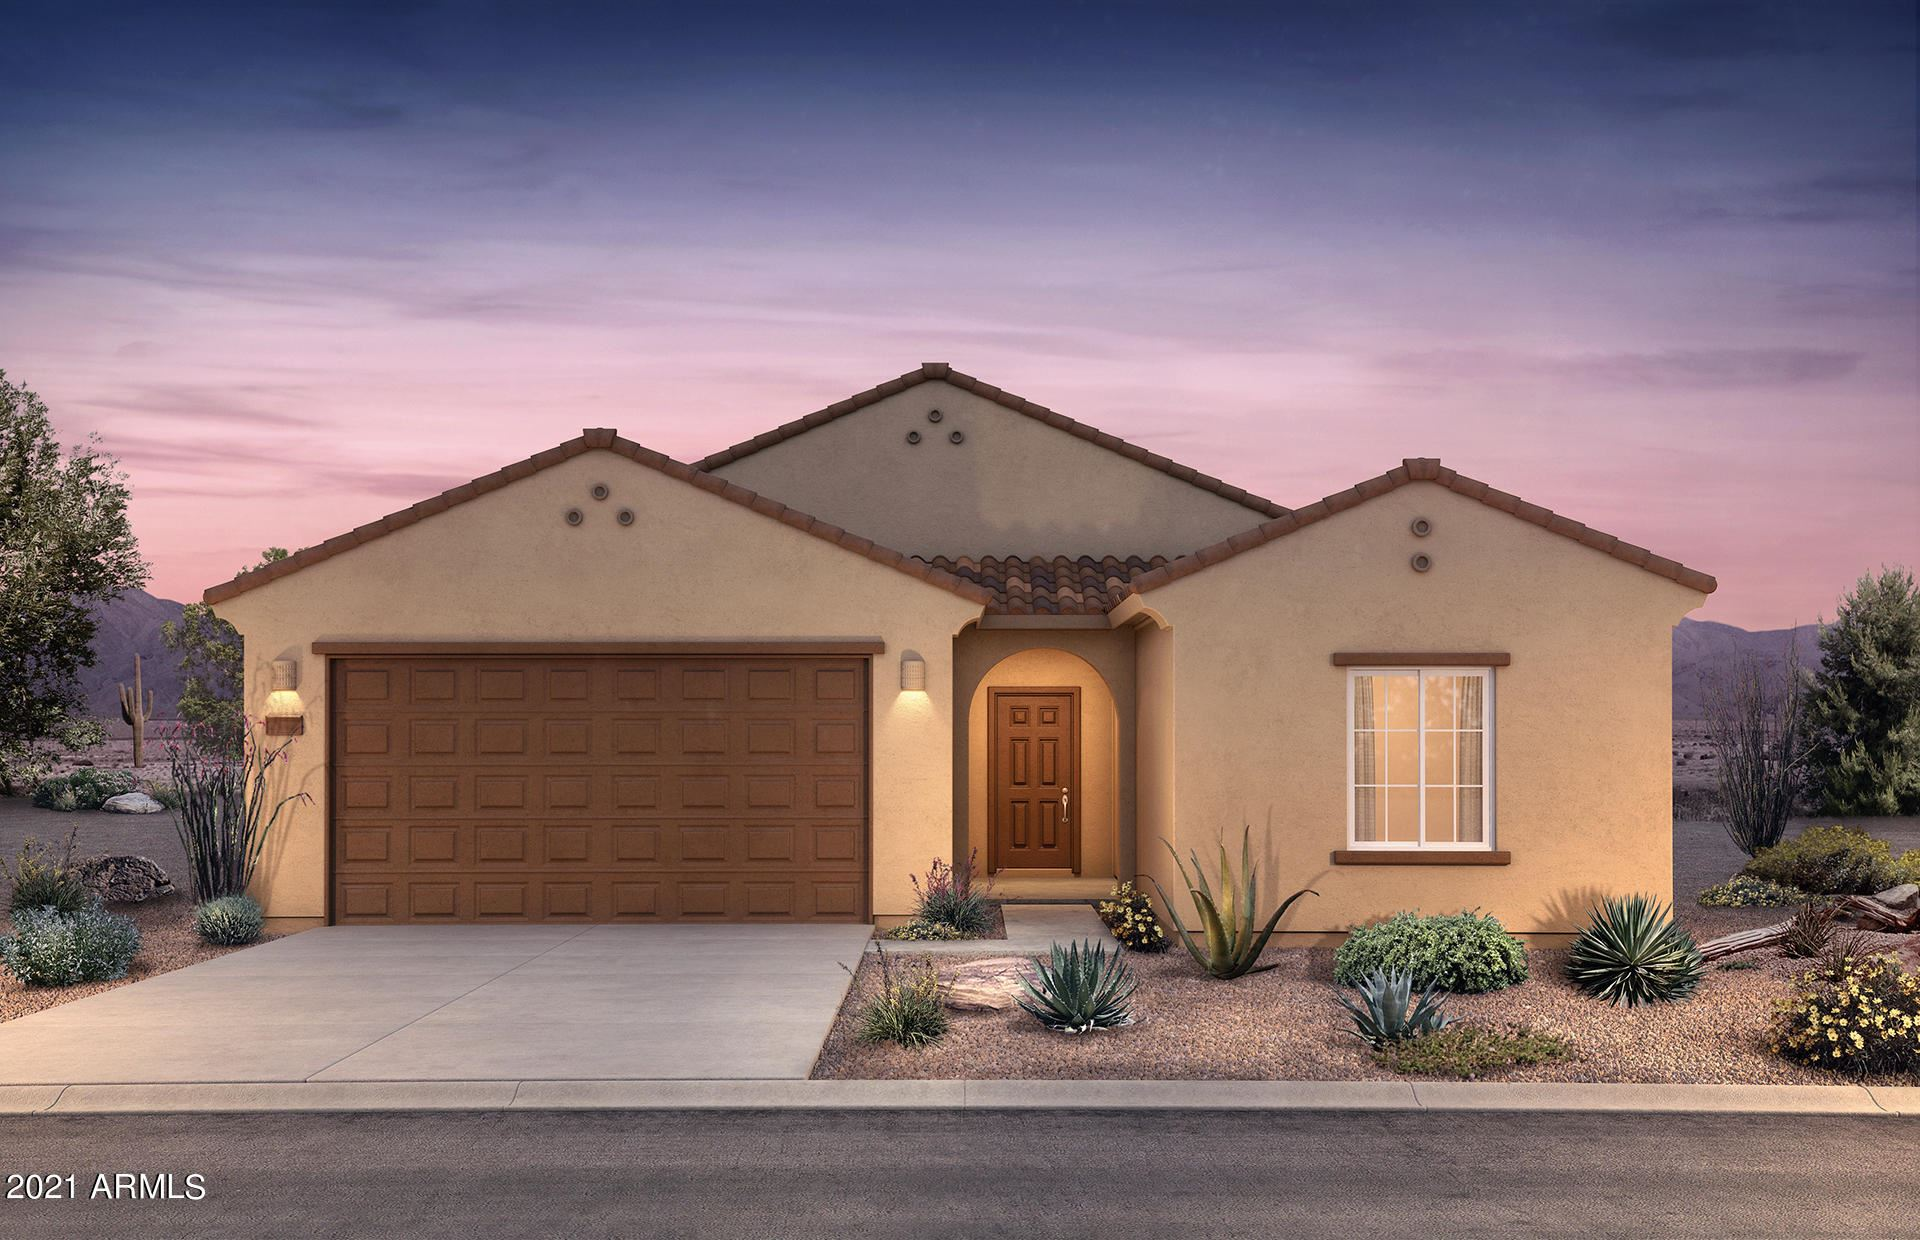 Photo for 43700 W MESCAL Street, Maricopa, AZ 85138 (MLS # 6283228)